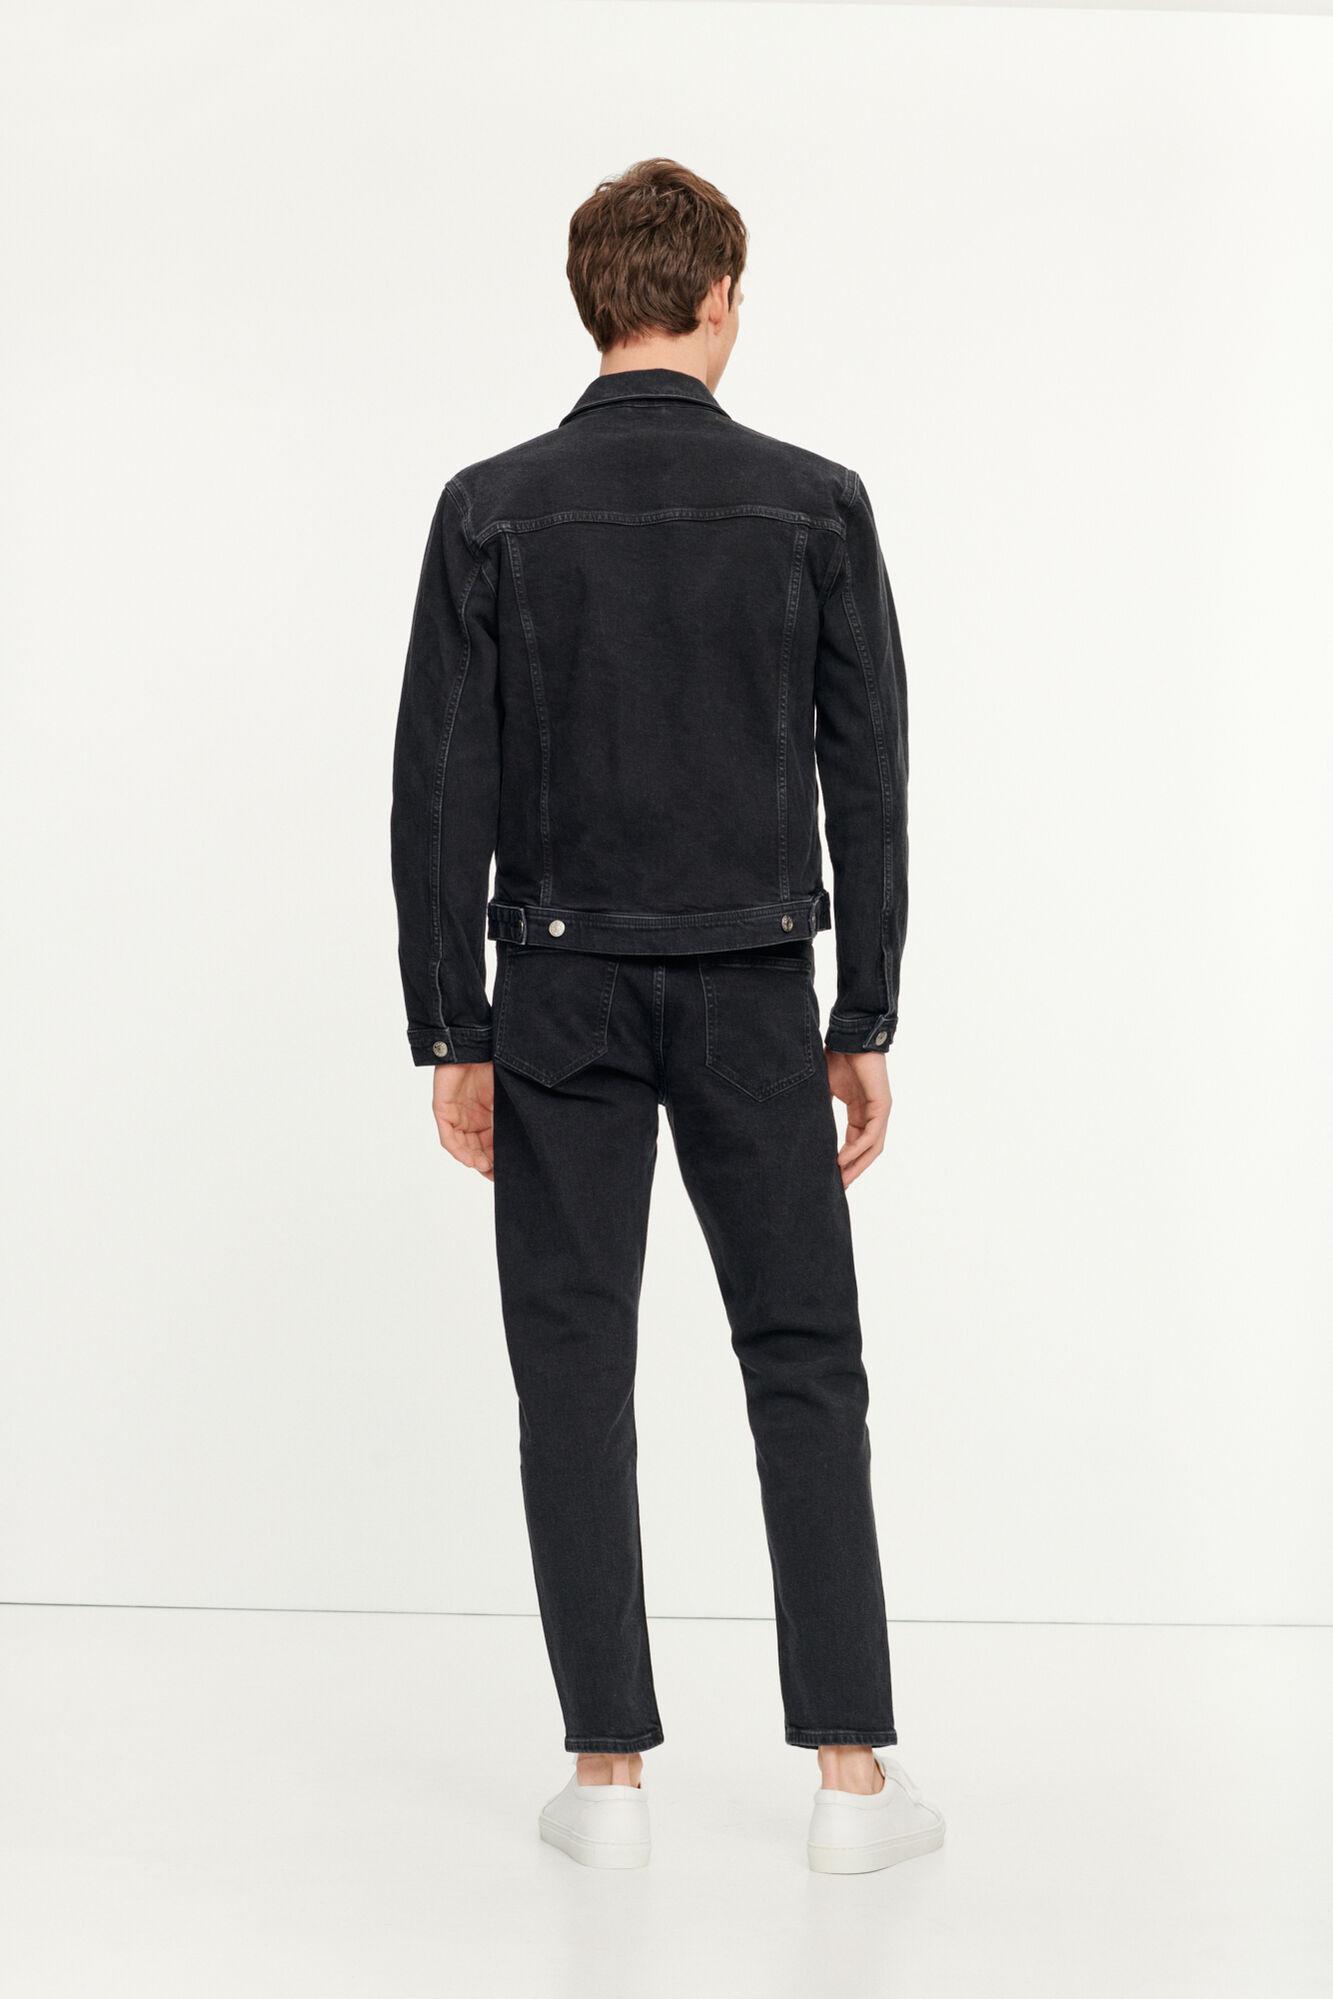 Laust Jacket 11356